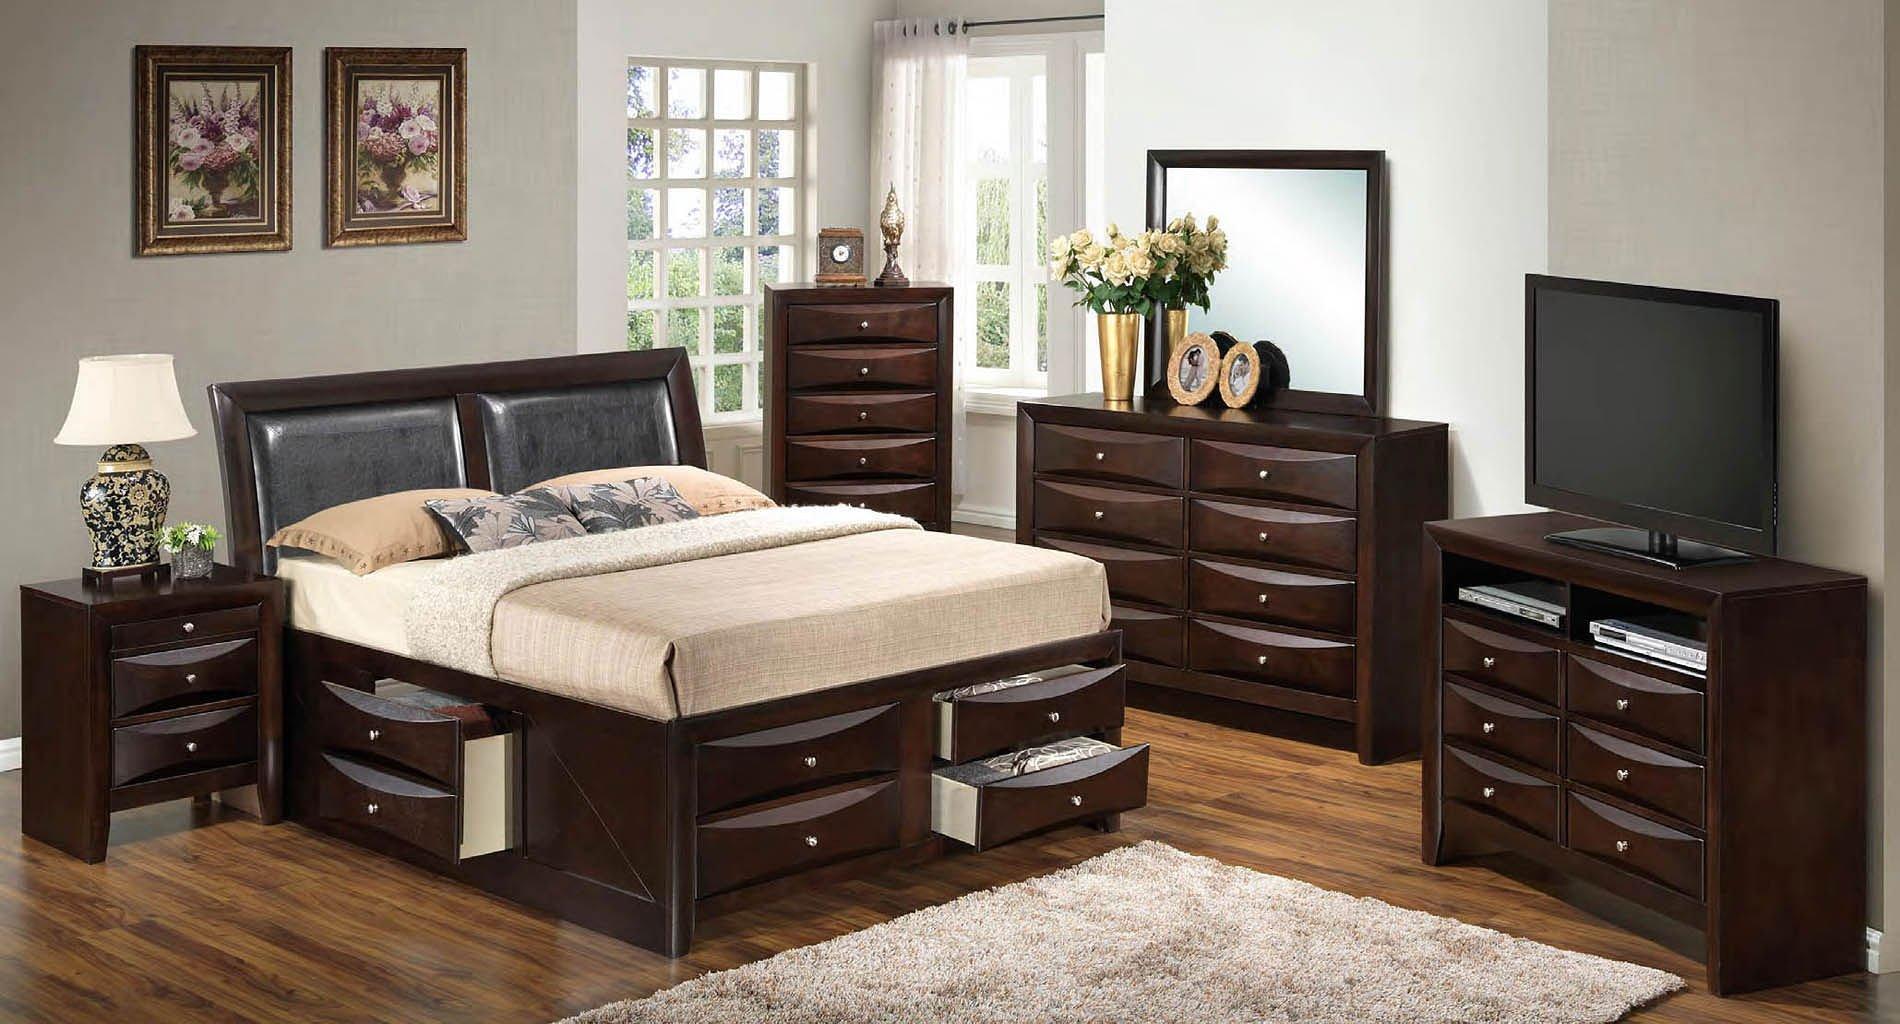 G1525i youth storage bedroom set glory furniture - Youth bedroom furniture with storage ...